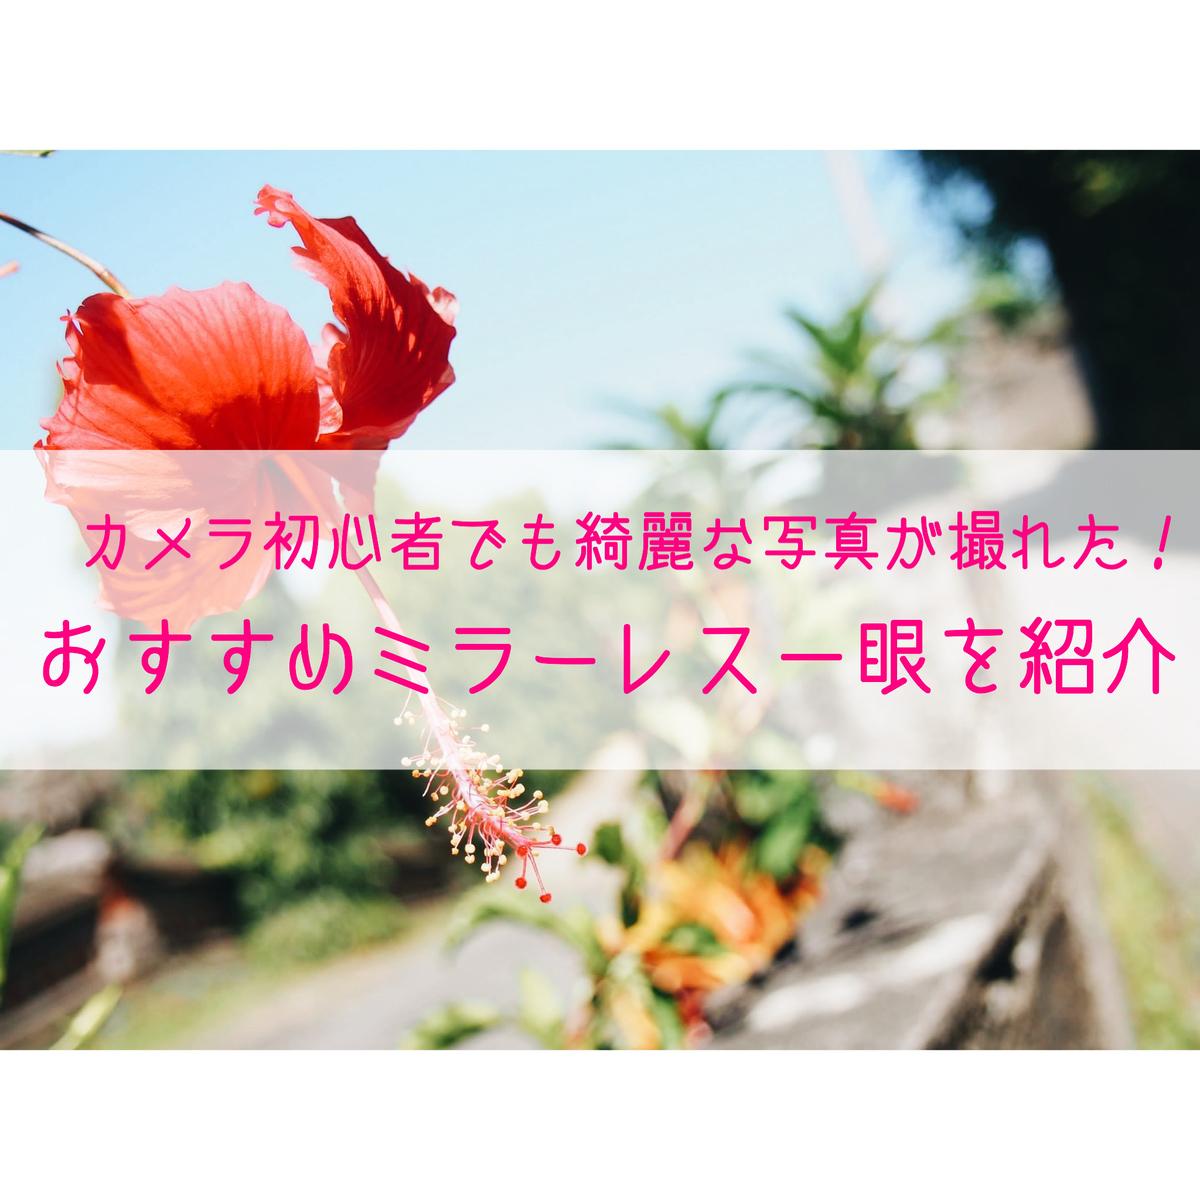 f:id:cherrycherry3504:20200731111827j:plain